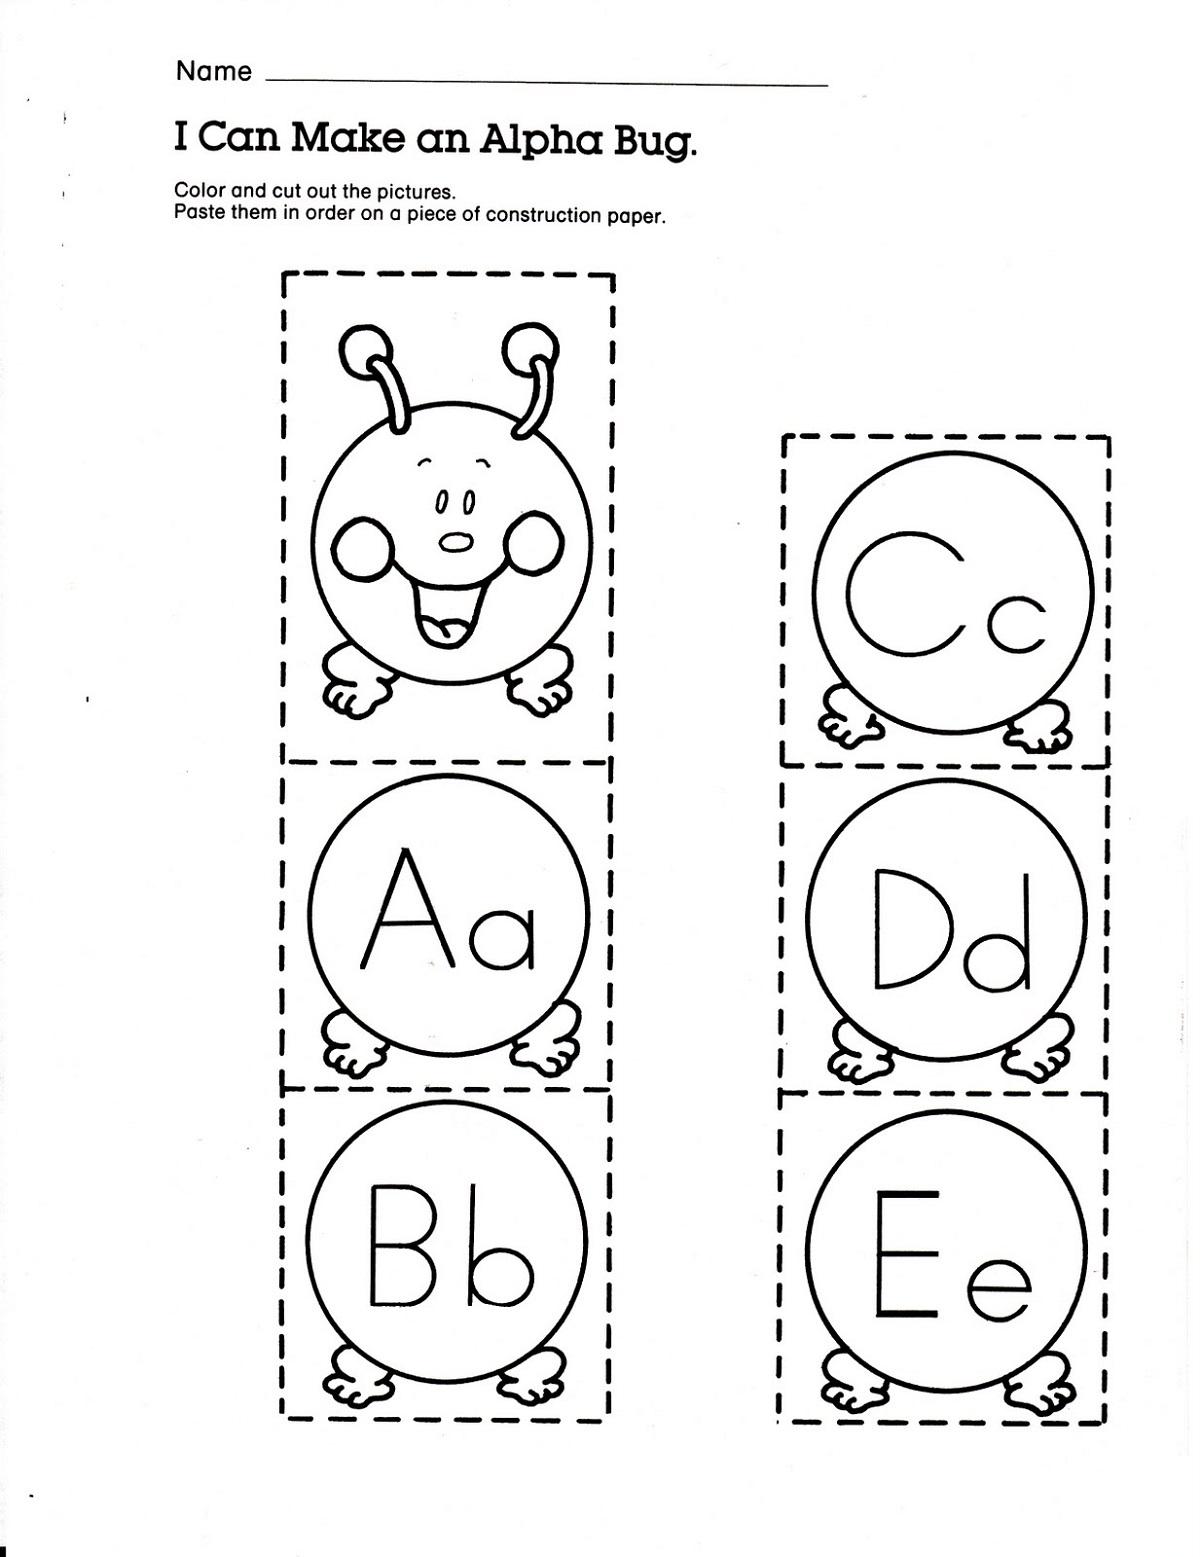 Alphabet Letter Worksheets For Kindergarten